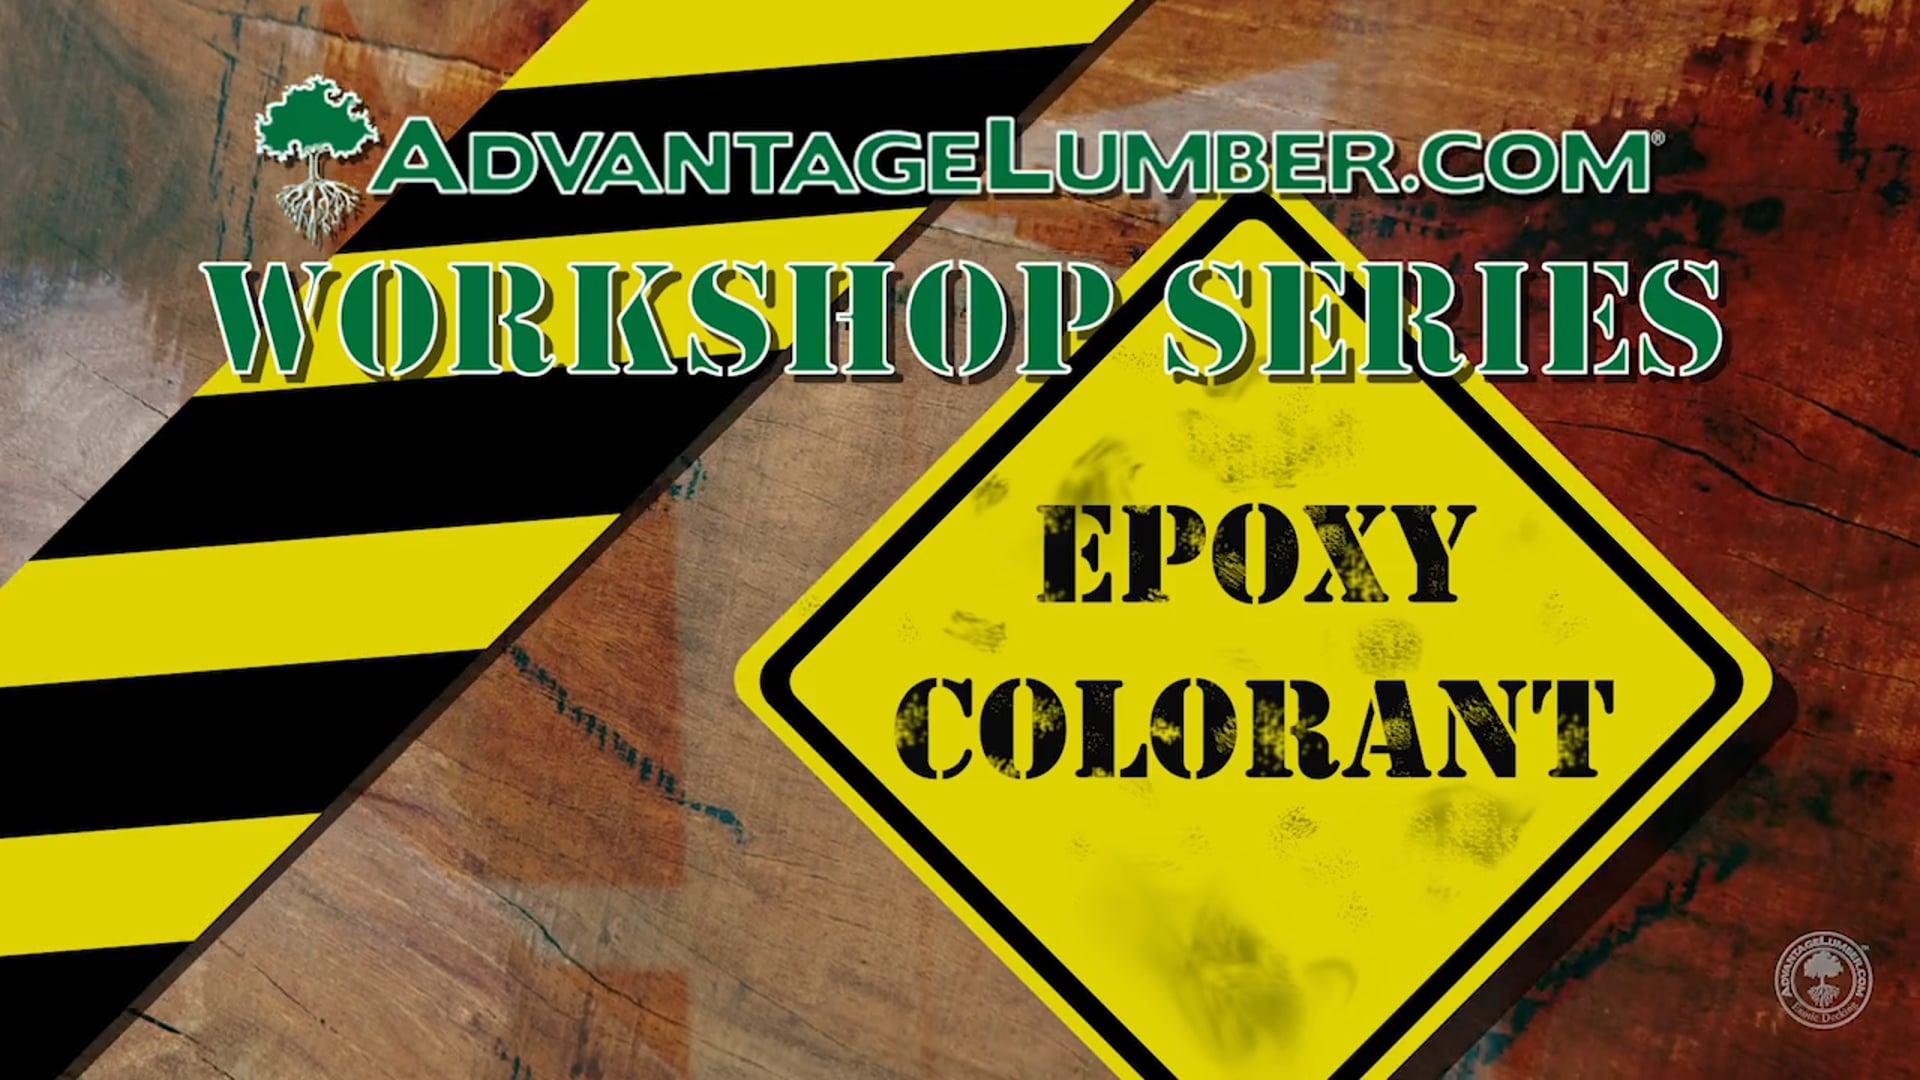 Advantage Workshop Series: Epoxy Colorant